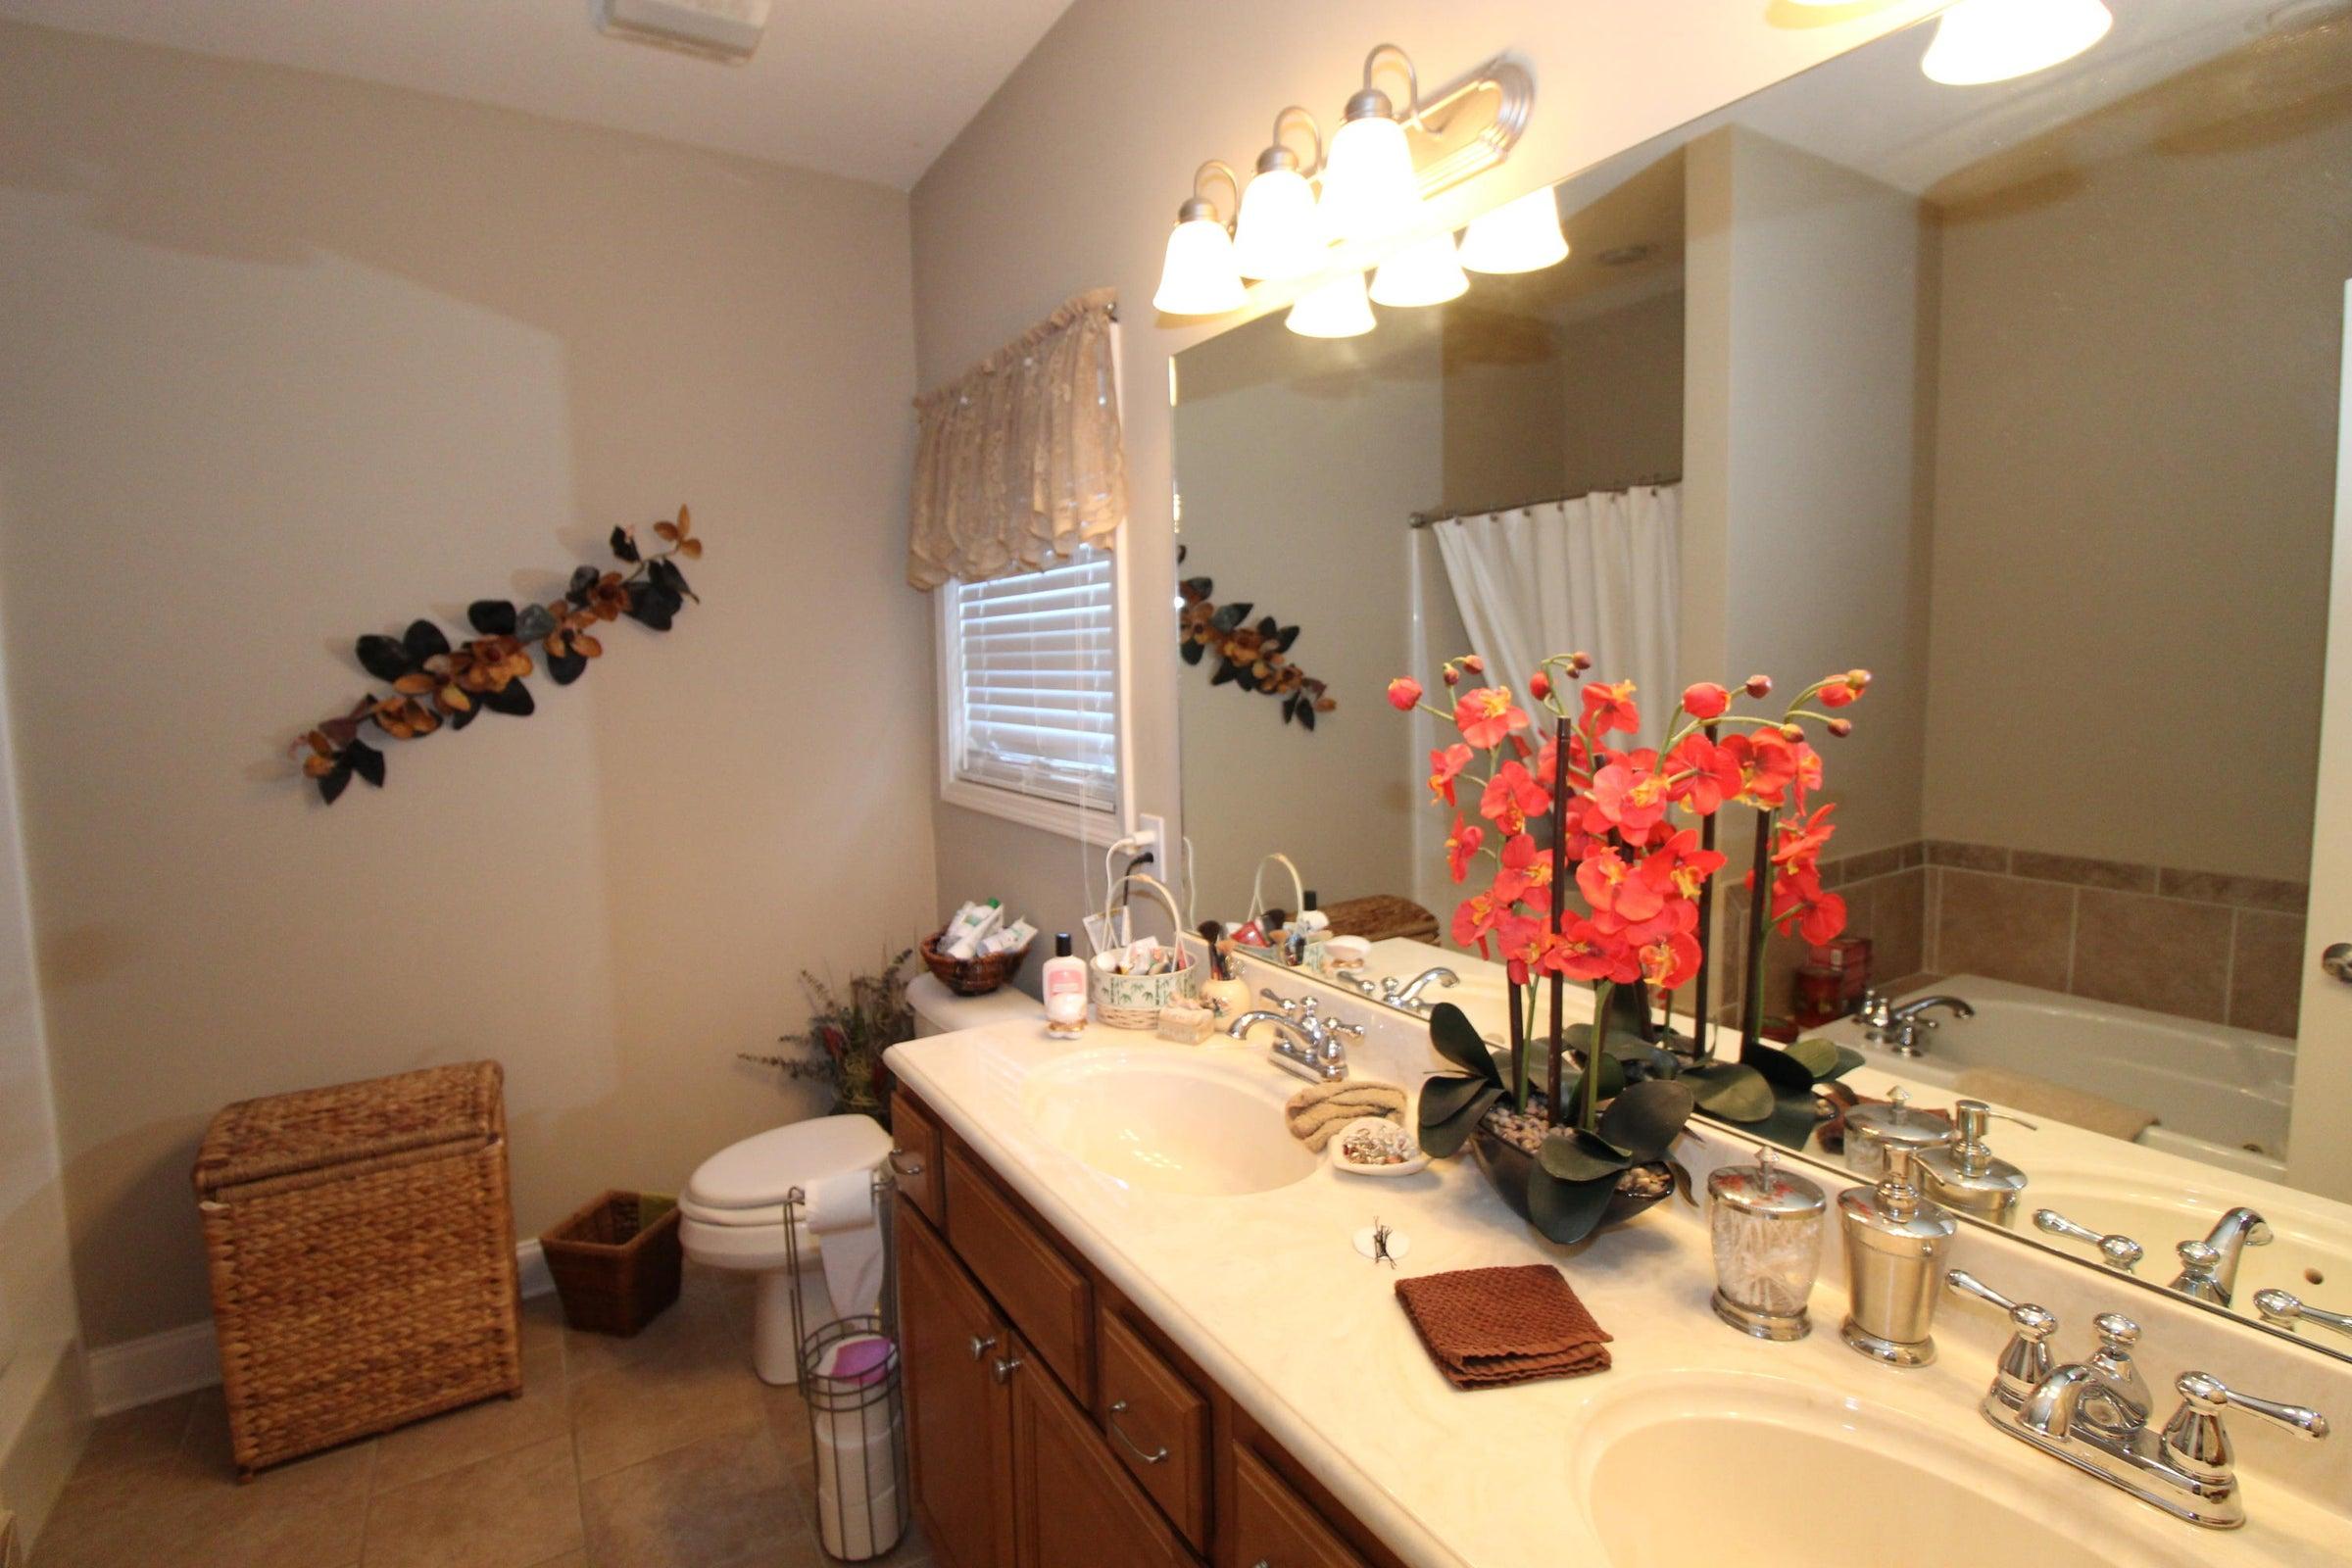 Mater bath, garden tub and shower